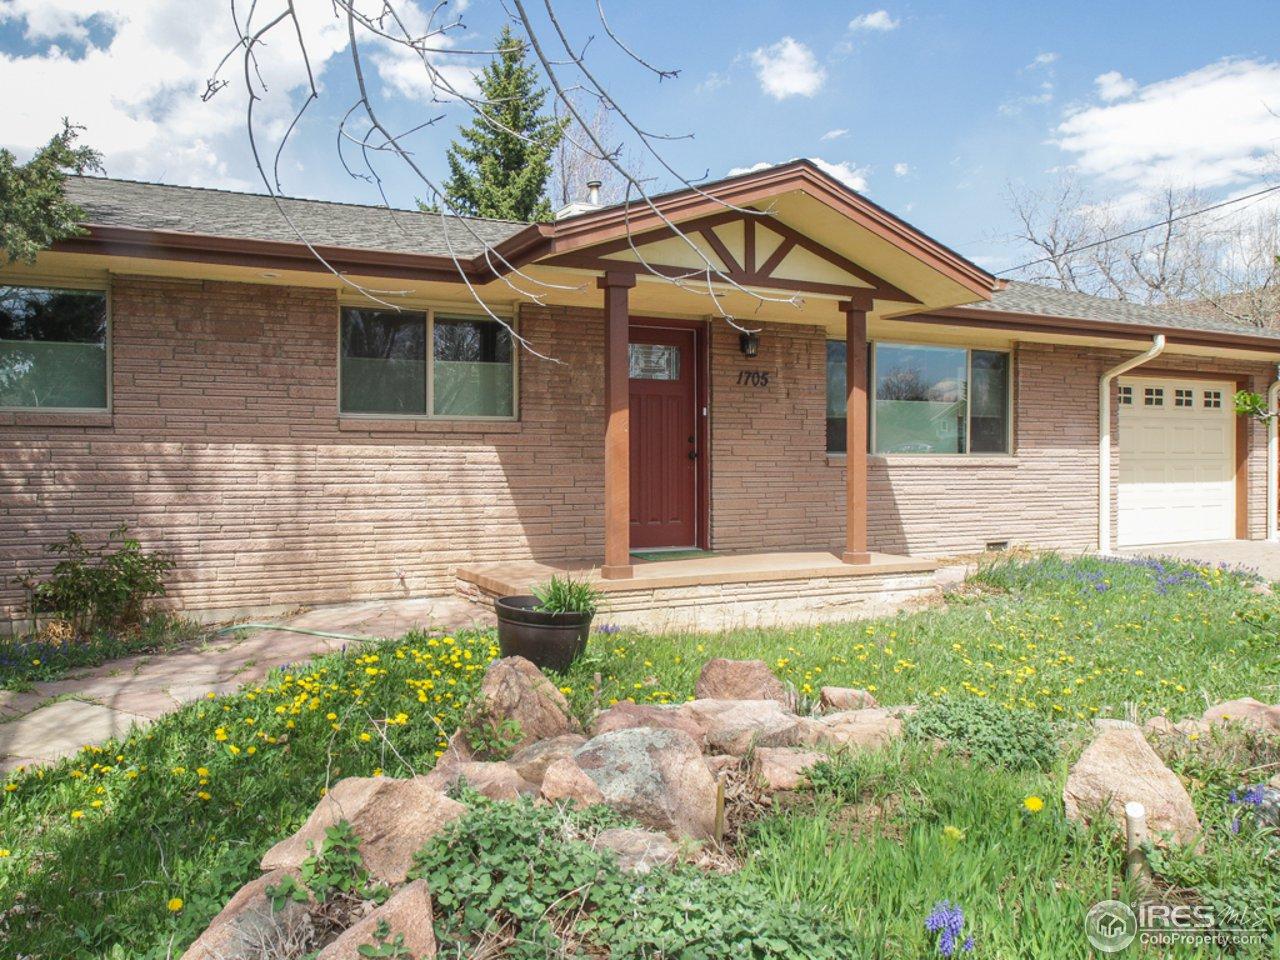 1705 Iris Ave, Boulder, CO 80304